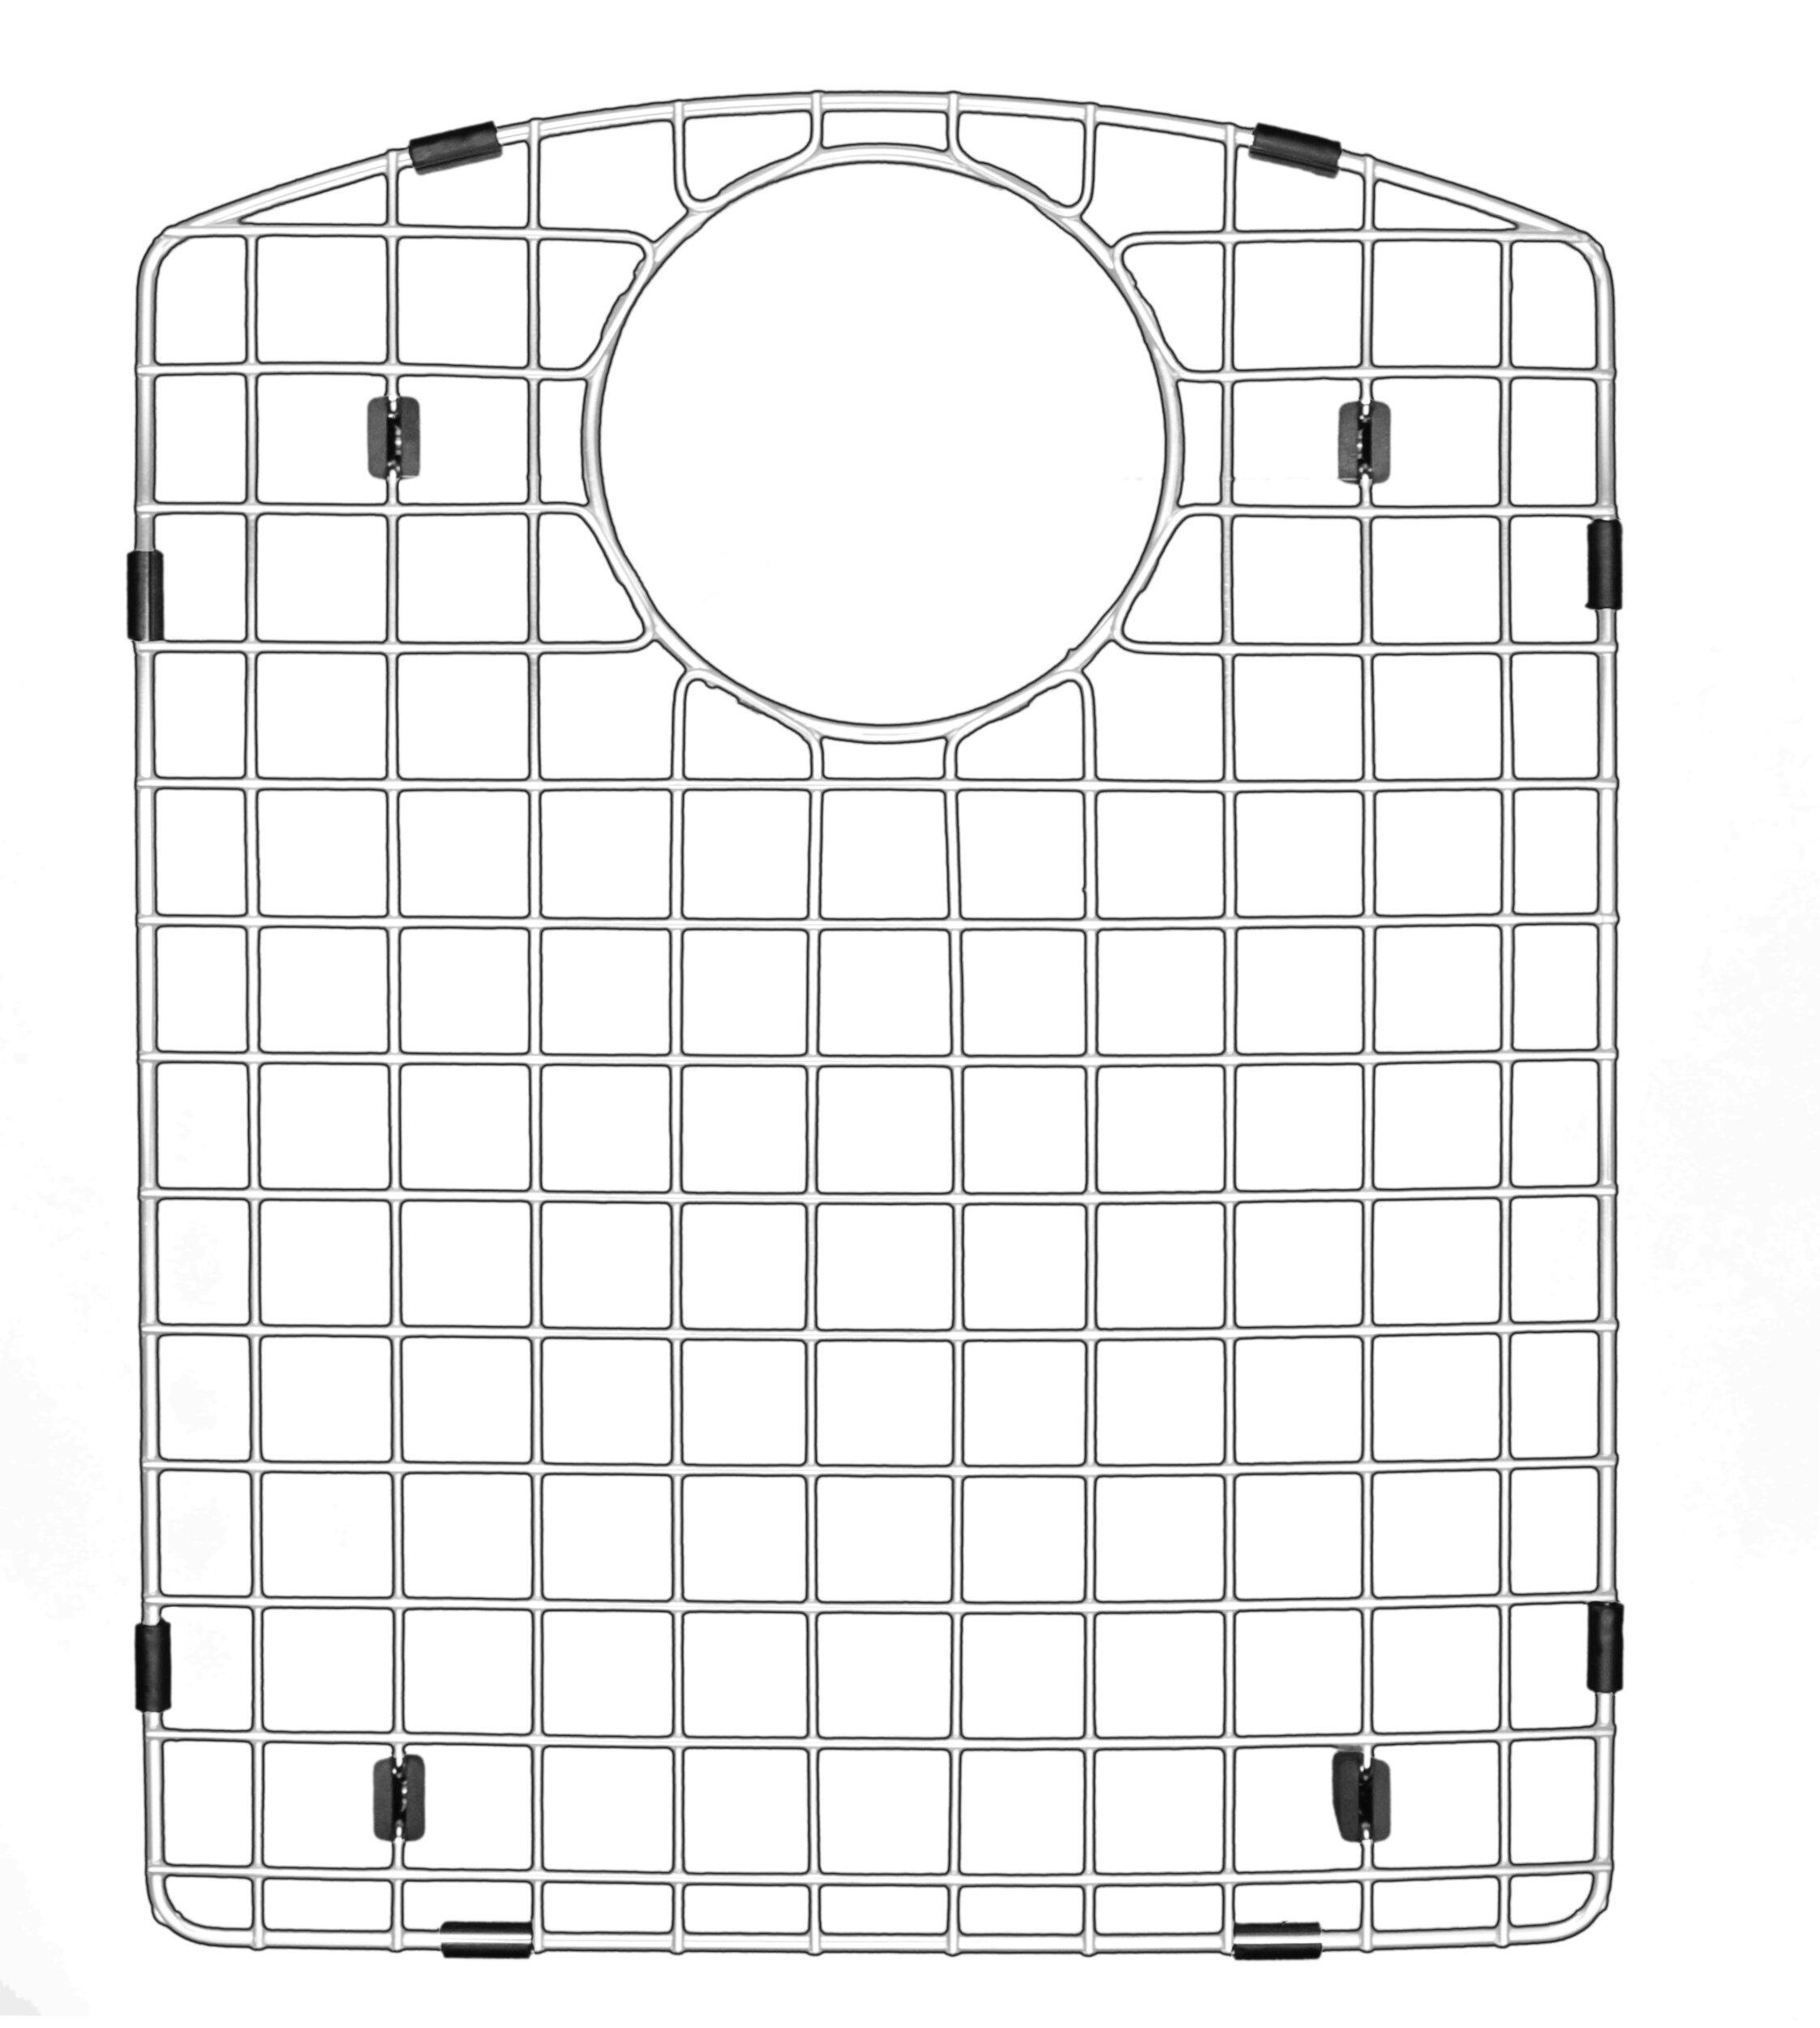 Karran 12 5 X 15 75 Sink Grid Wayfair